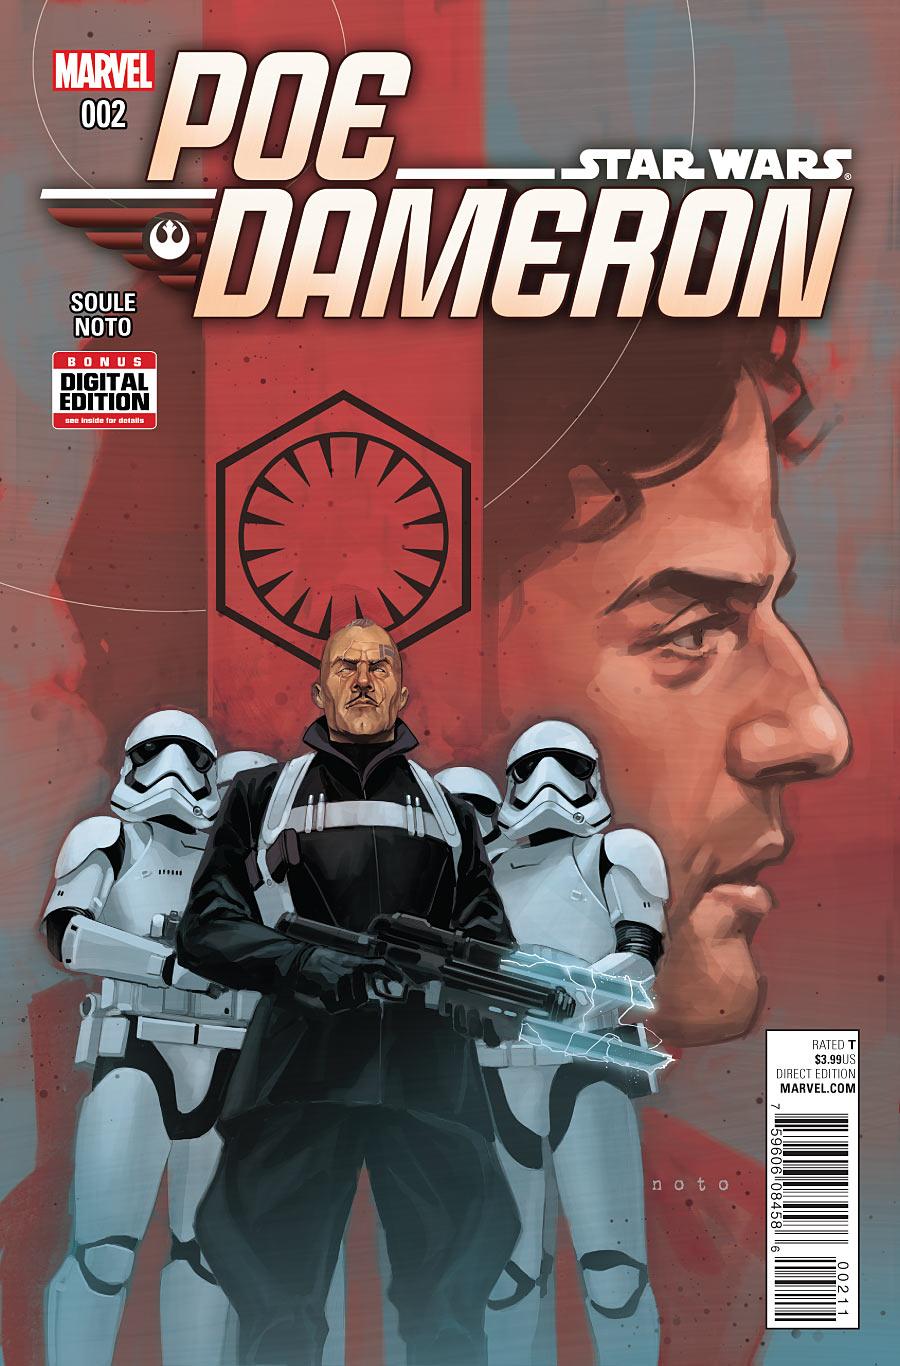 Star Wars: Poe Dameron #2